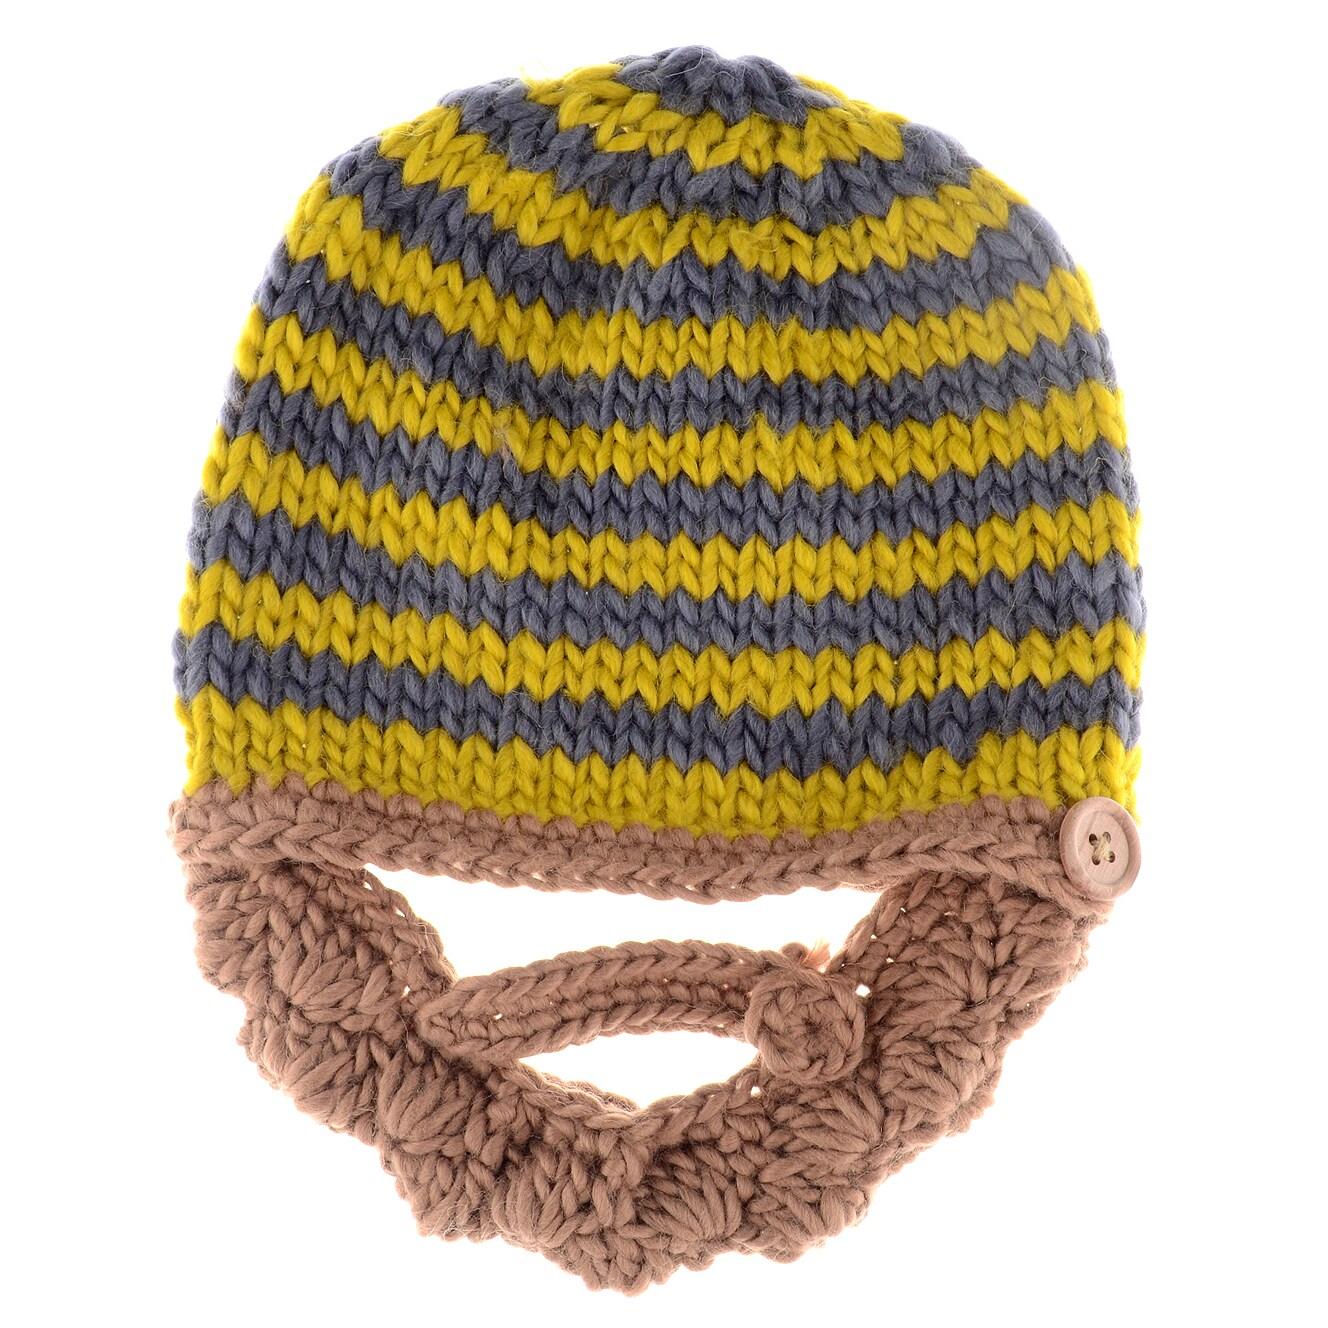 Crummy Bunny Hand Crocheted Baby Beanie Hat Beard (Blonde...